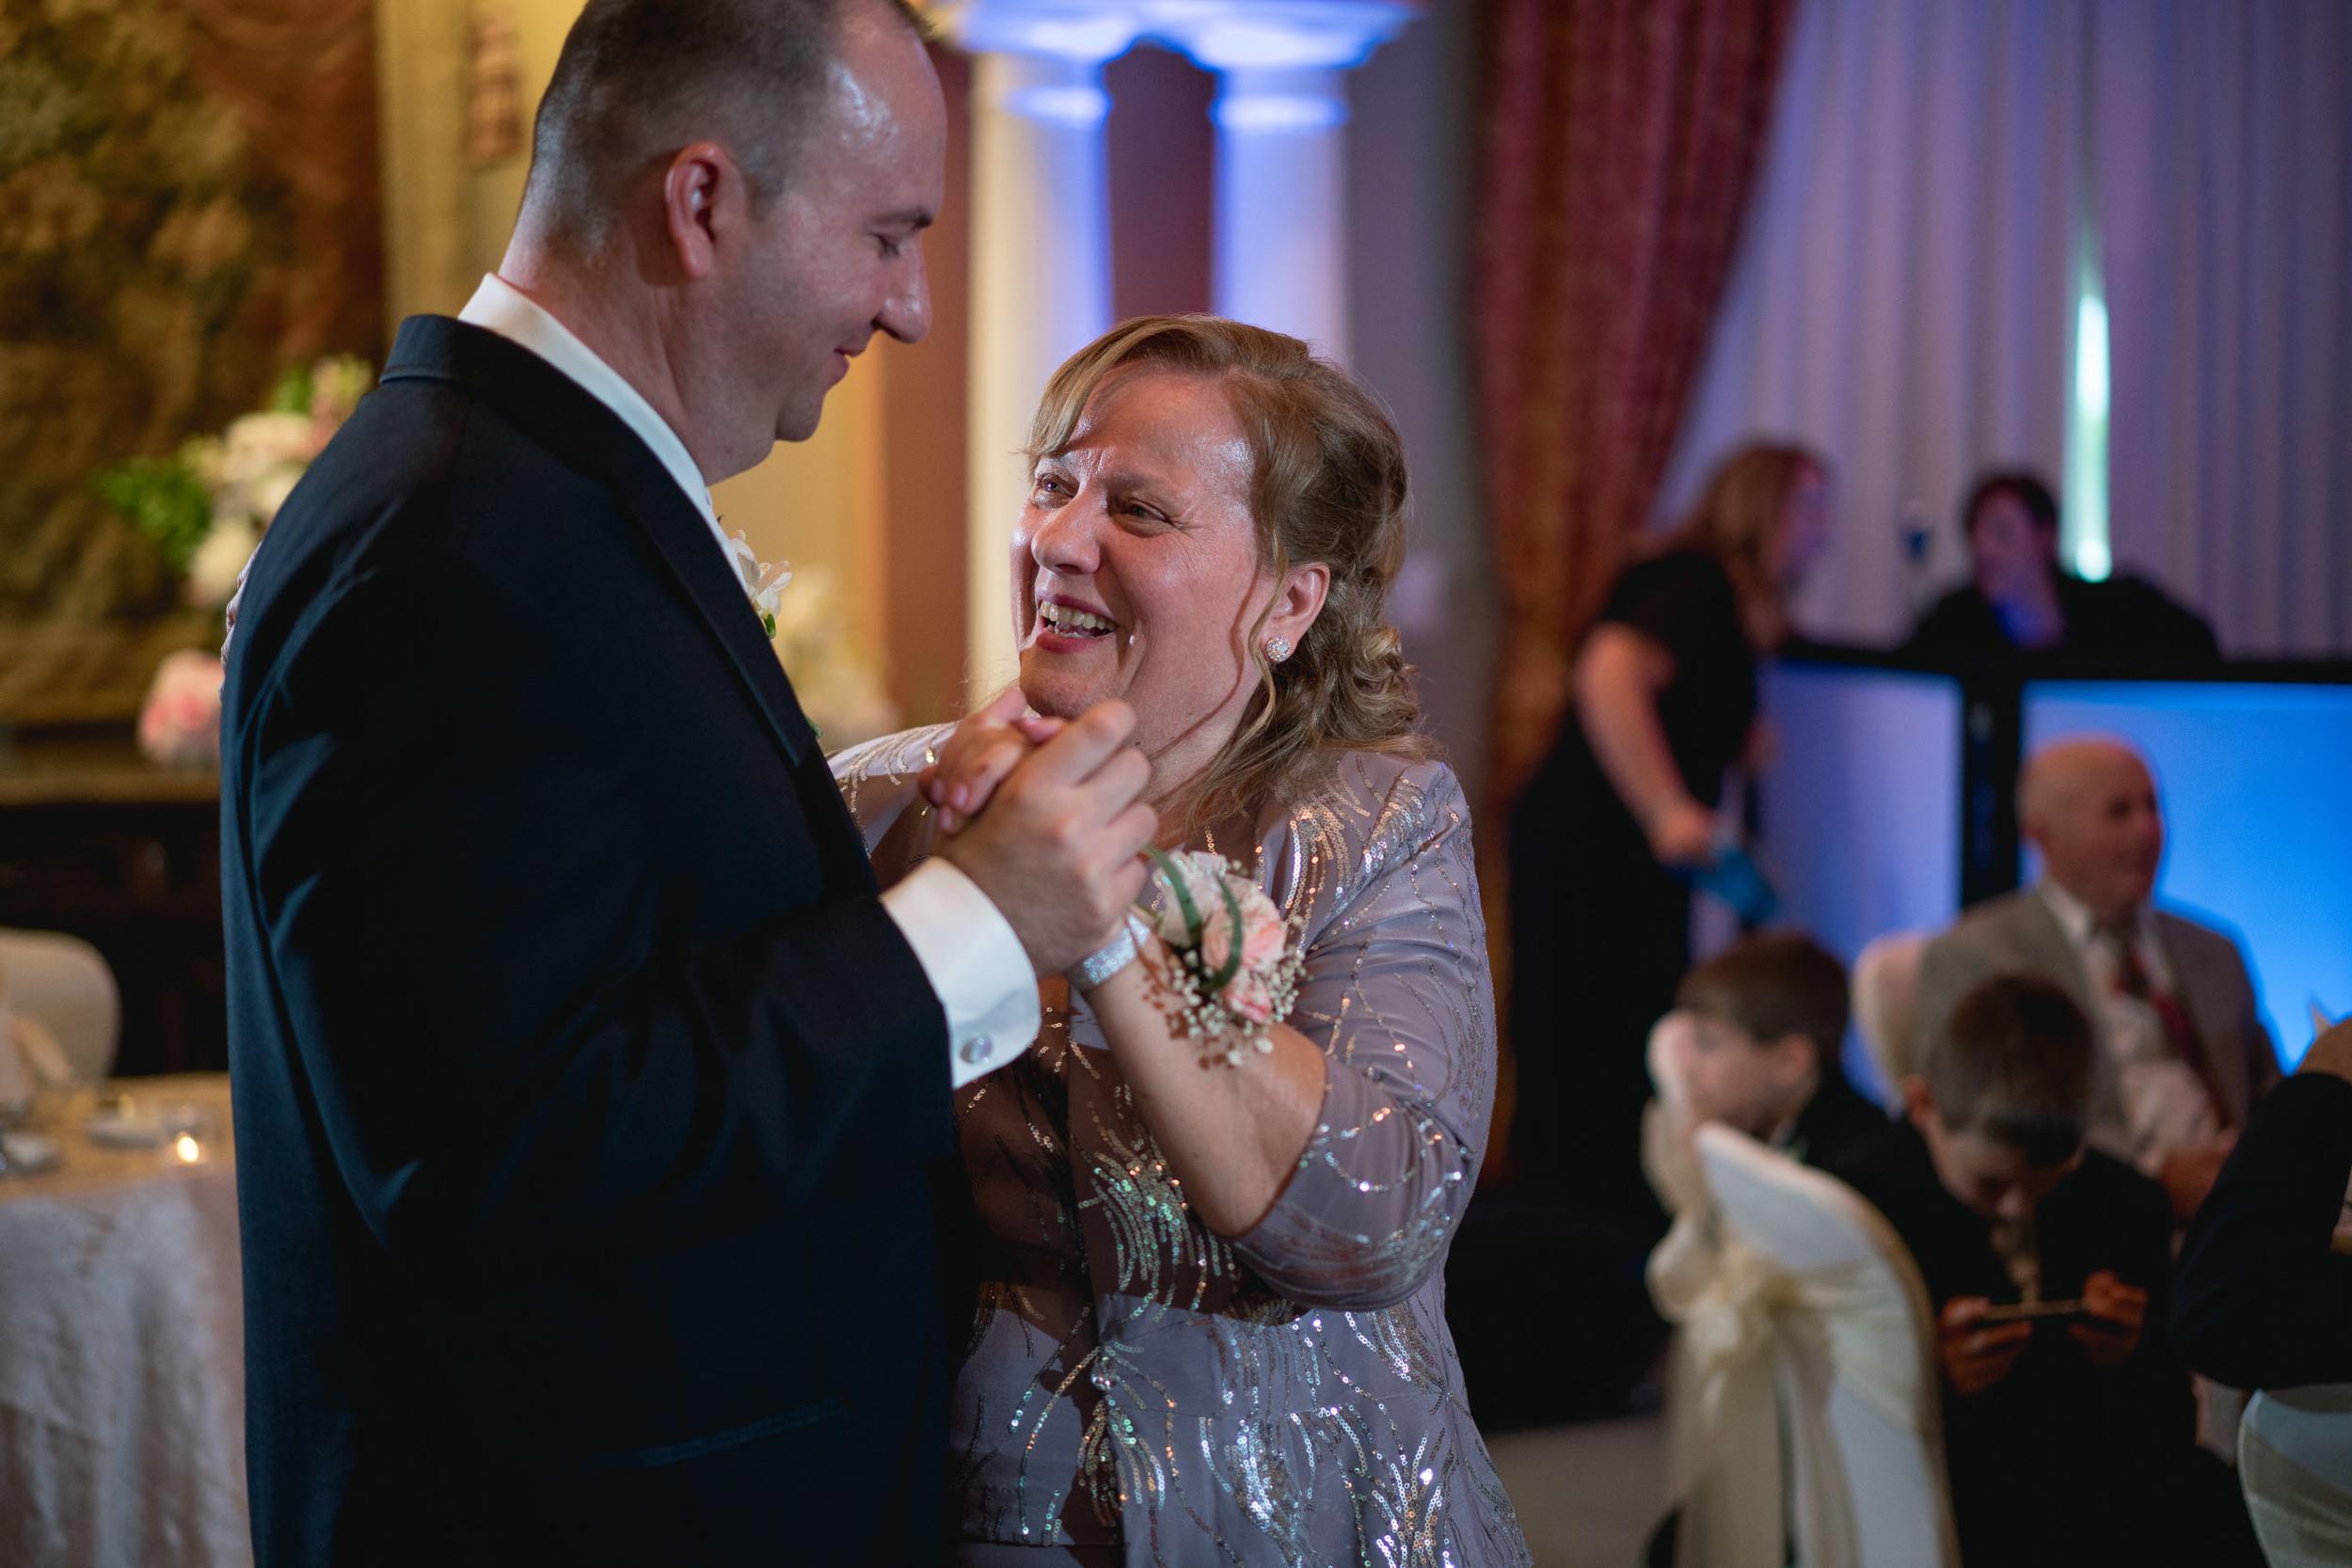 Portland Wedding photograper -Timothy Capp Photography (472 of 678).jpg